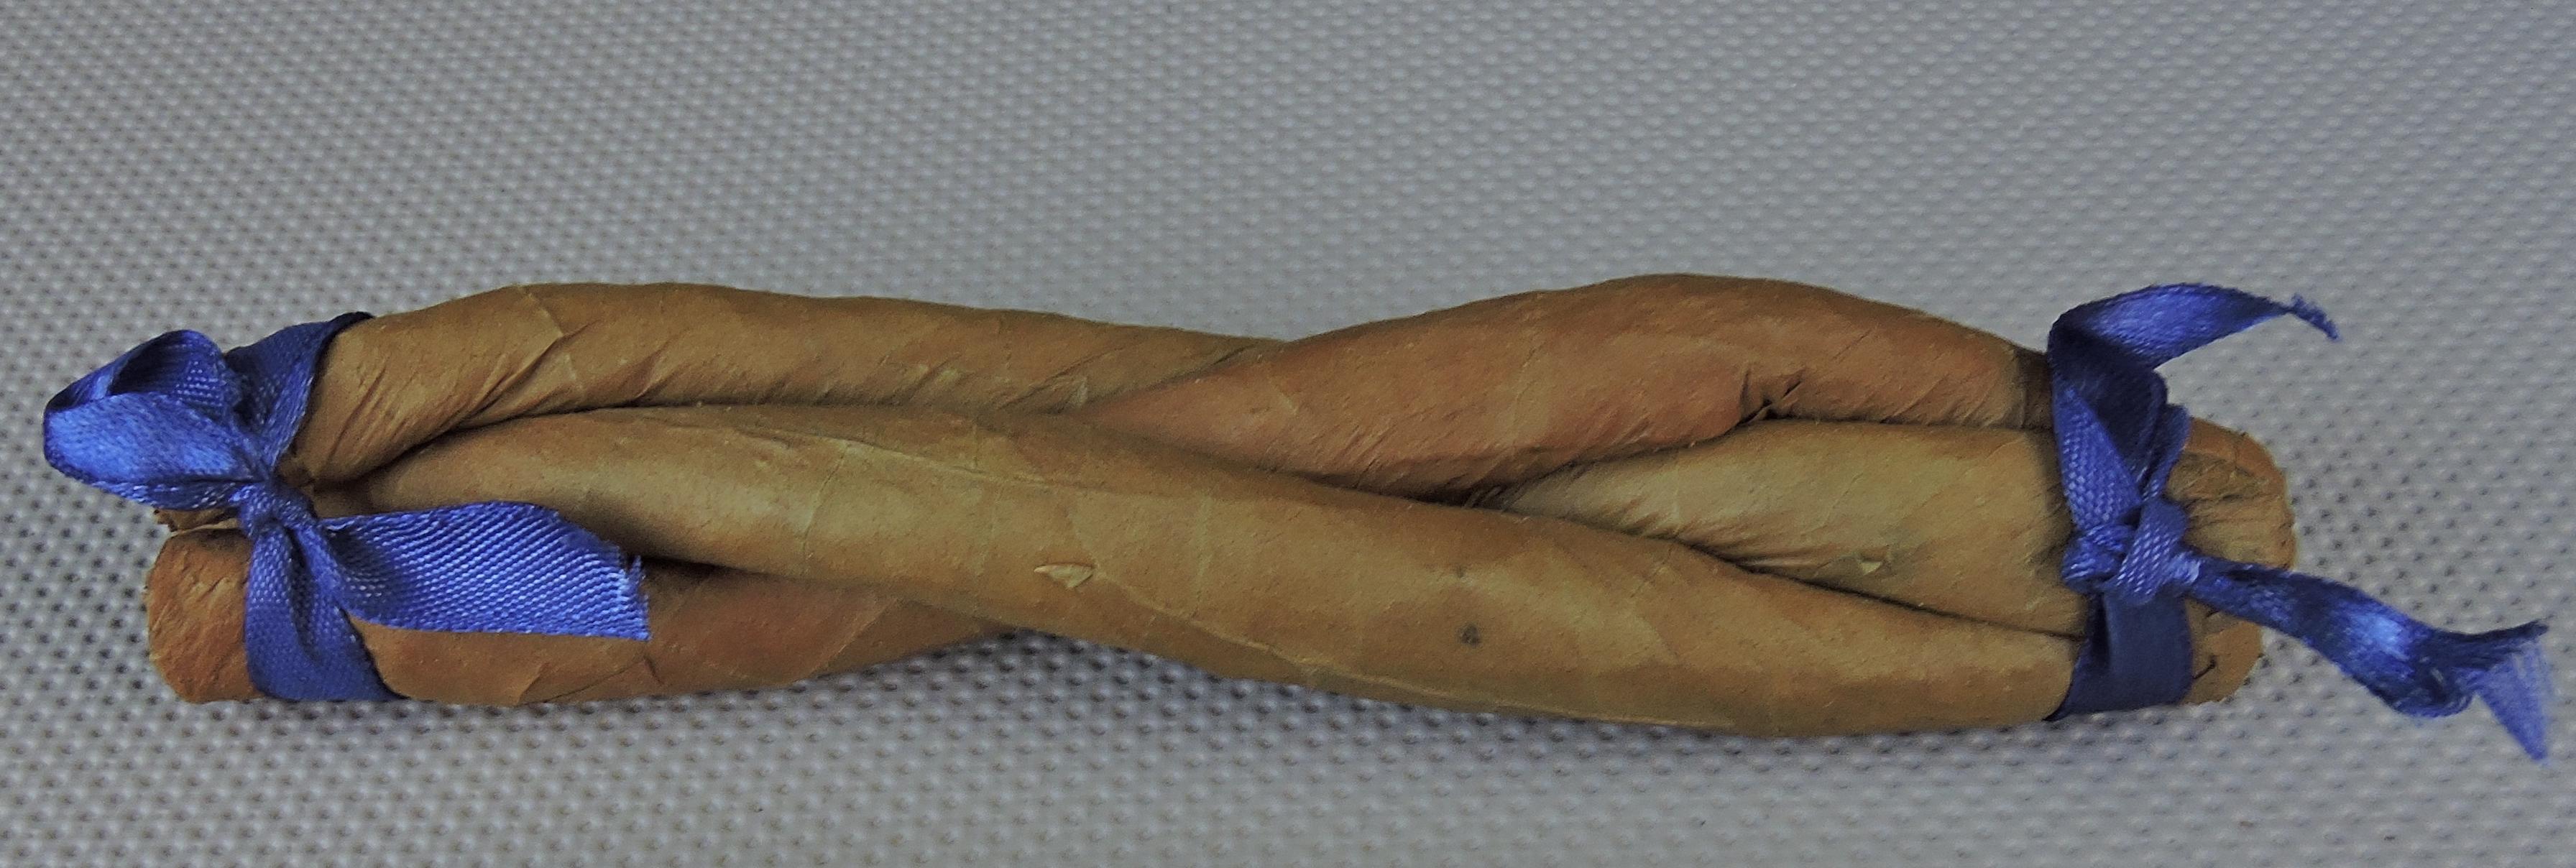 Agile Cigar Review: Eastern Standard Dos Firmas (Caldwell Signature) Culebra by Caldwell Cigar Company